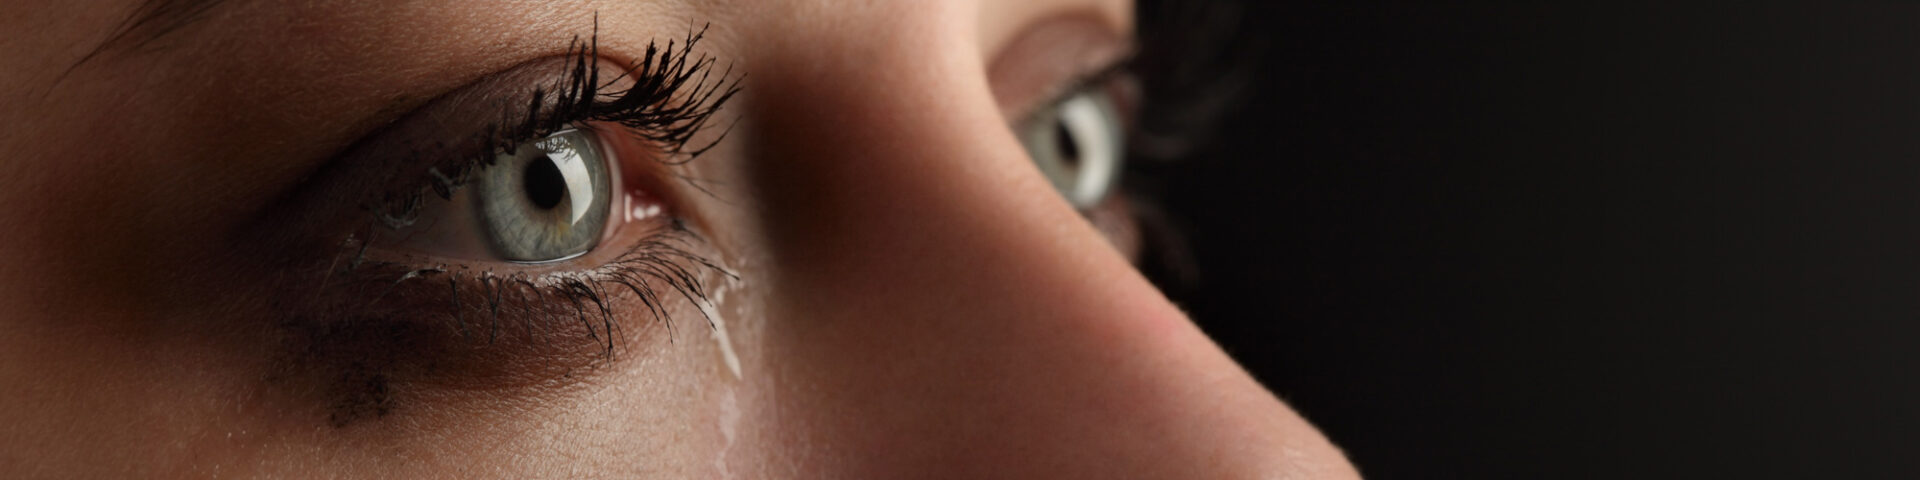 angst-traume-traumatiseret-ptsd-terapi-psykologi-psykiatri